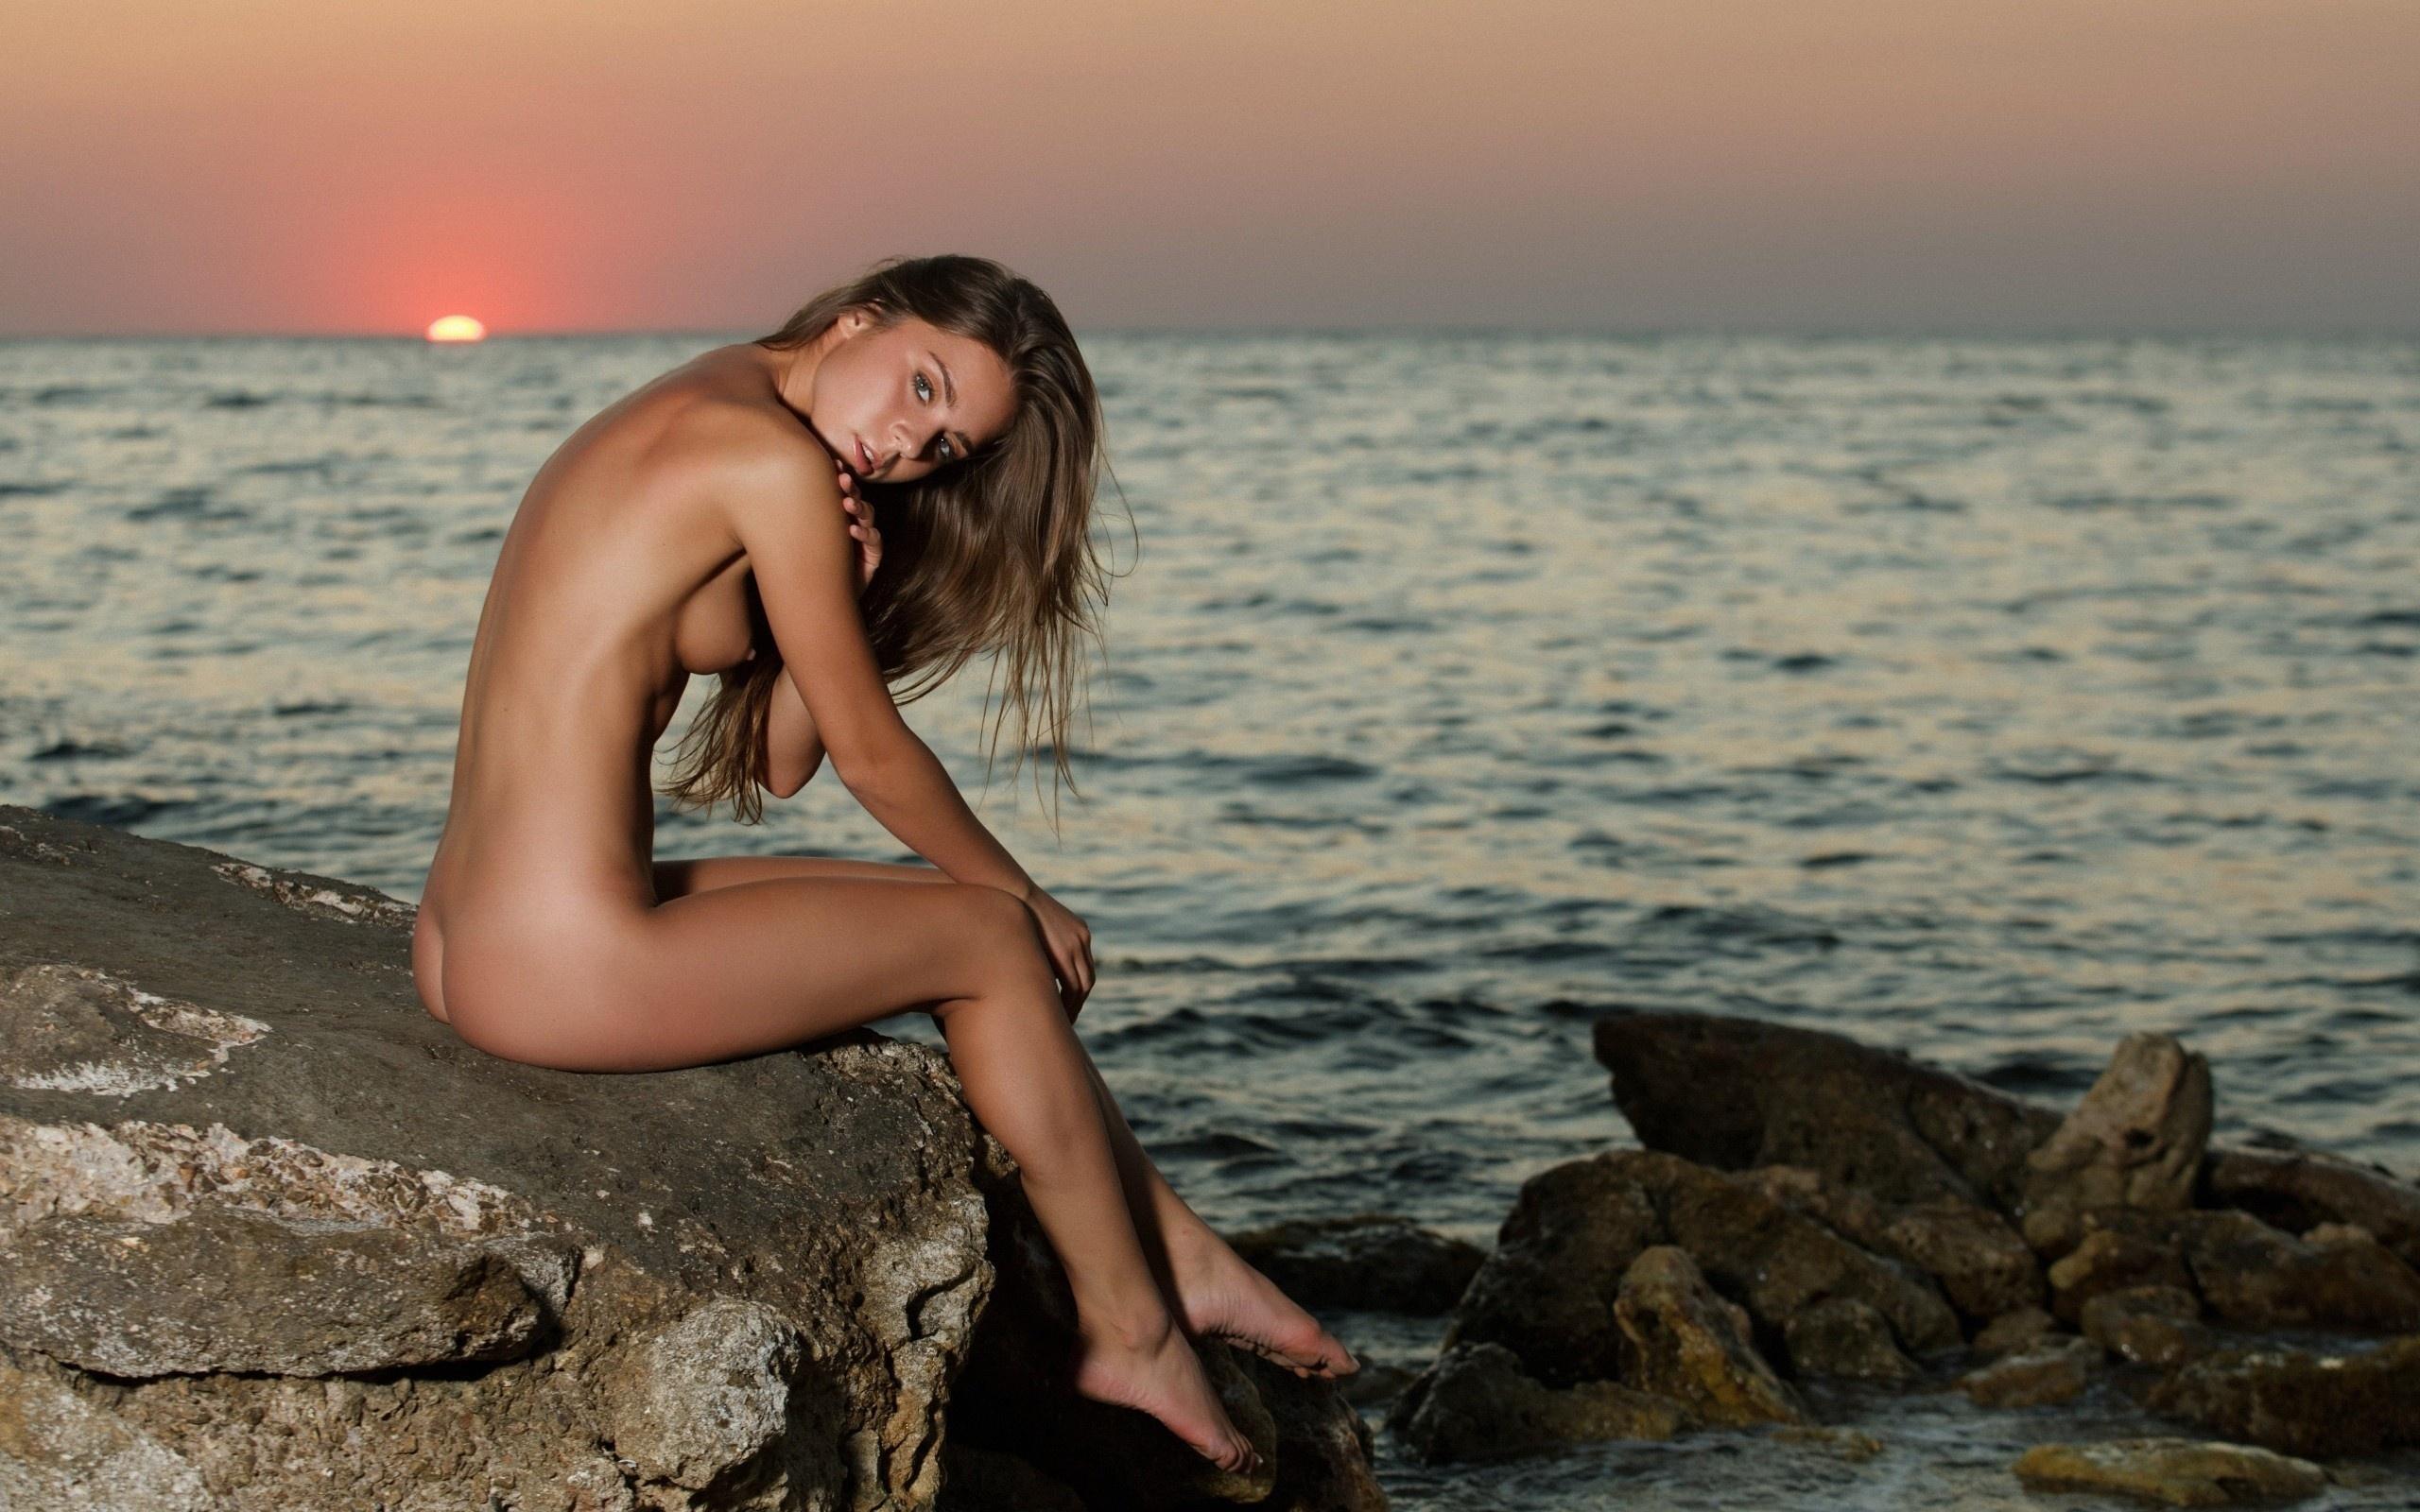 hot girl on beach wallpaper